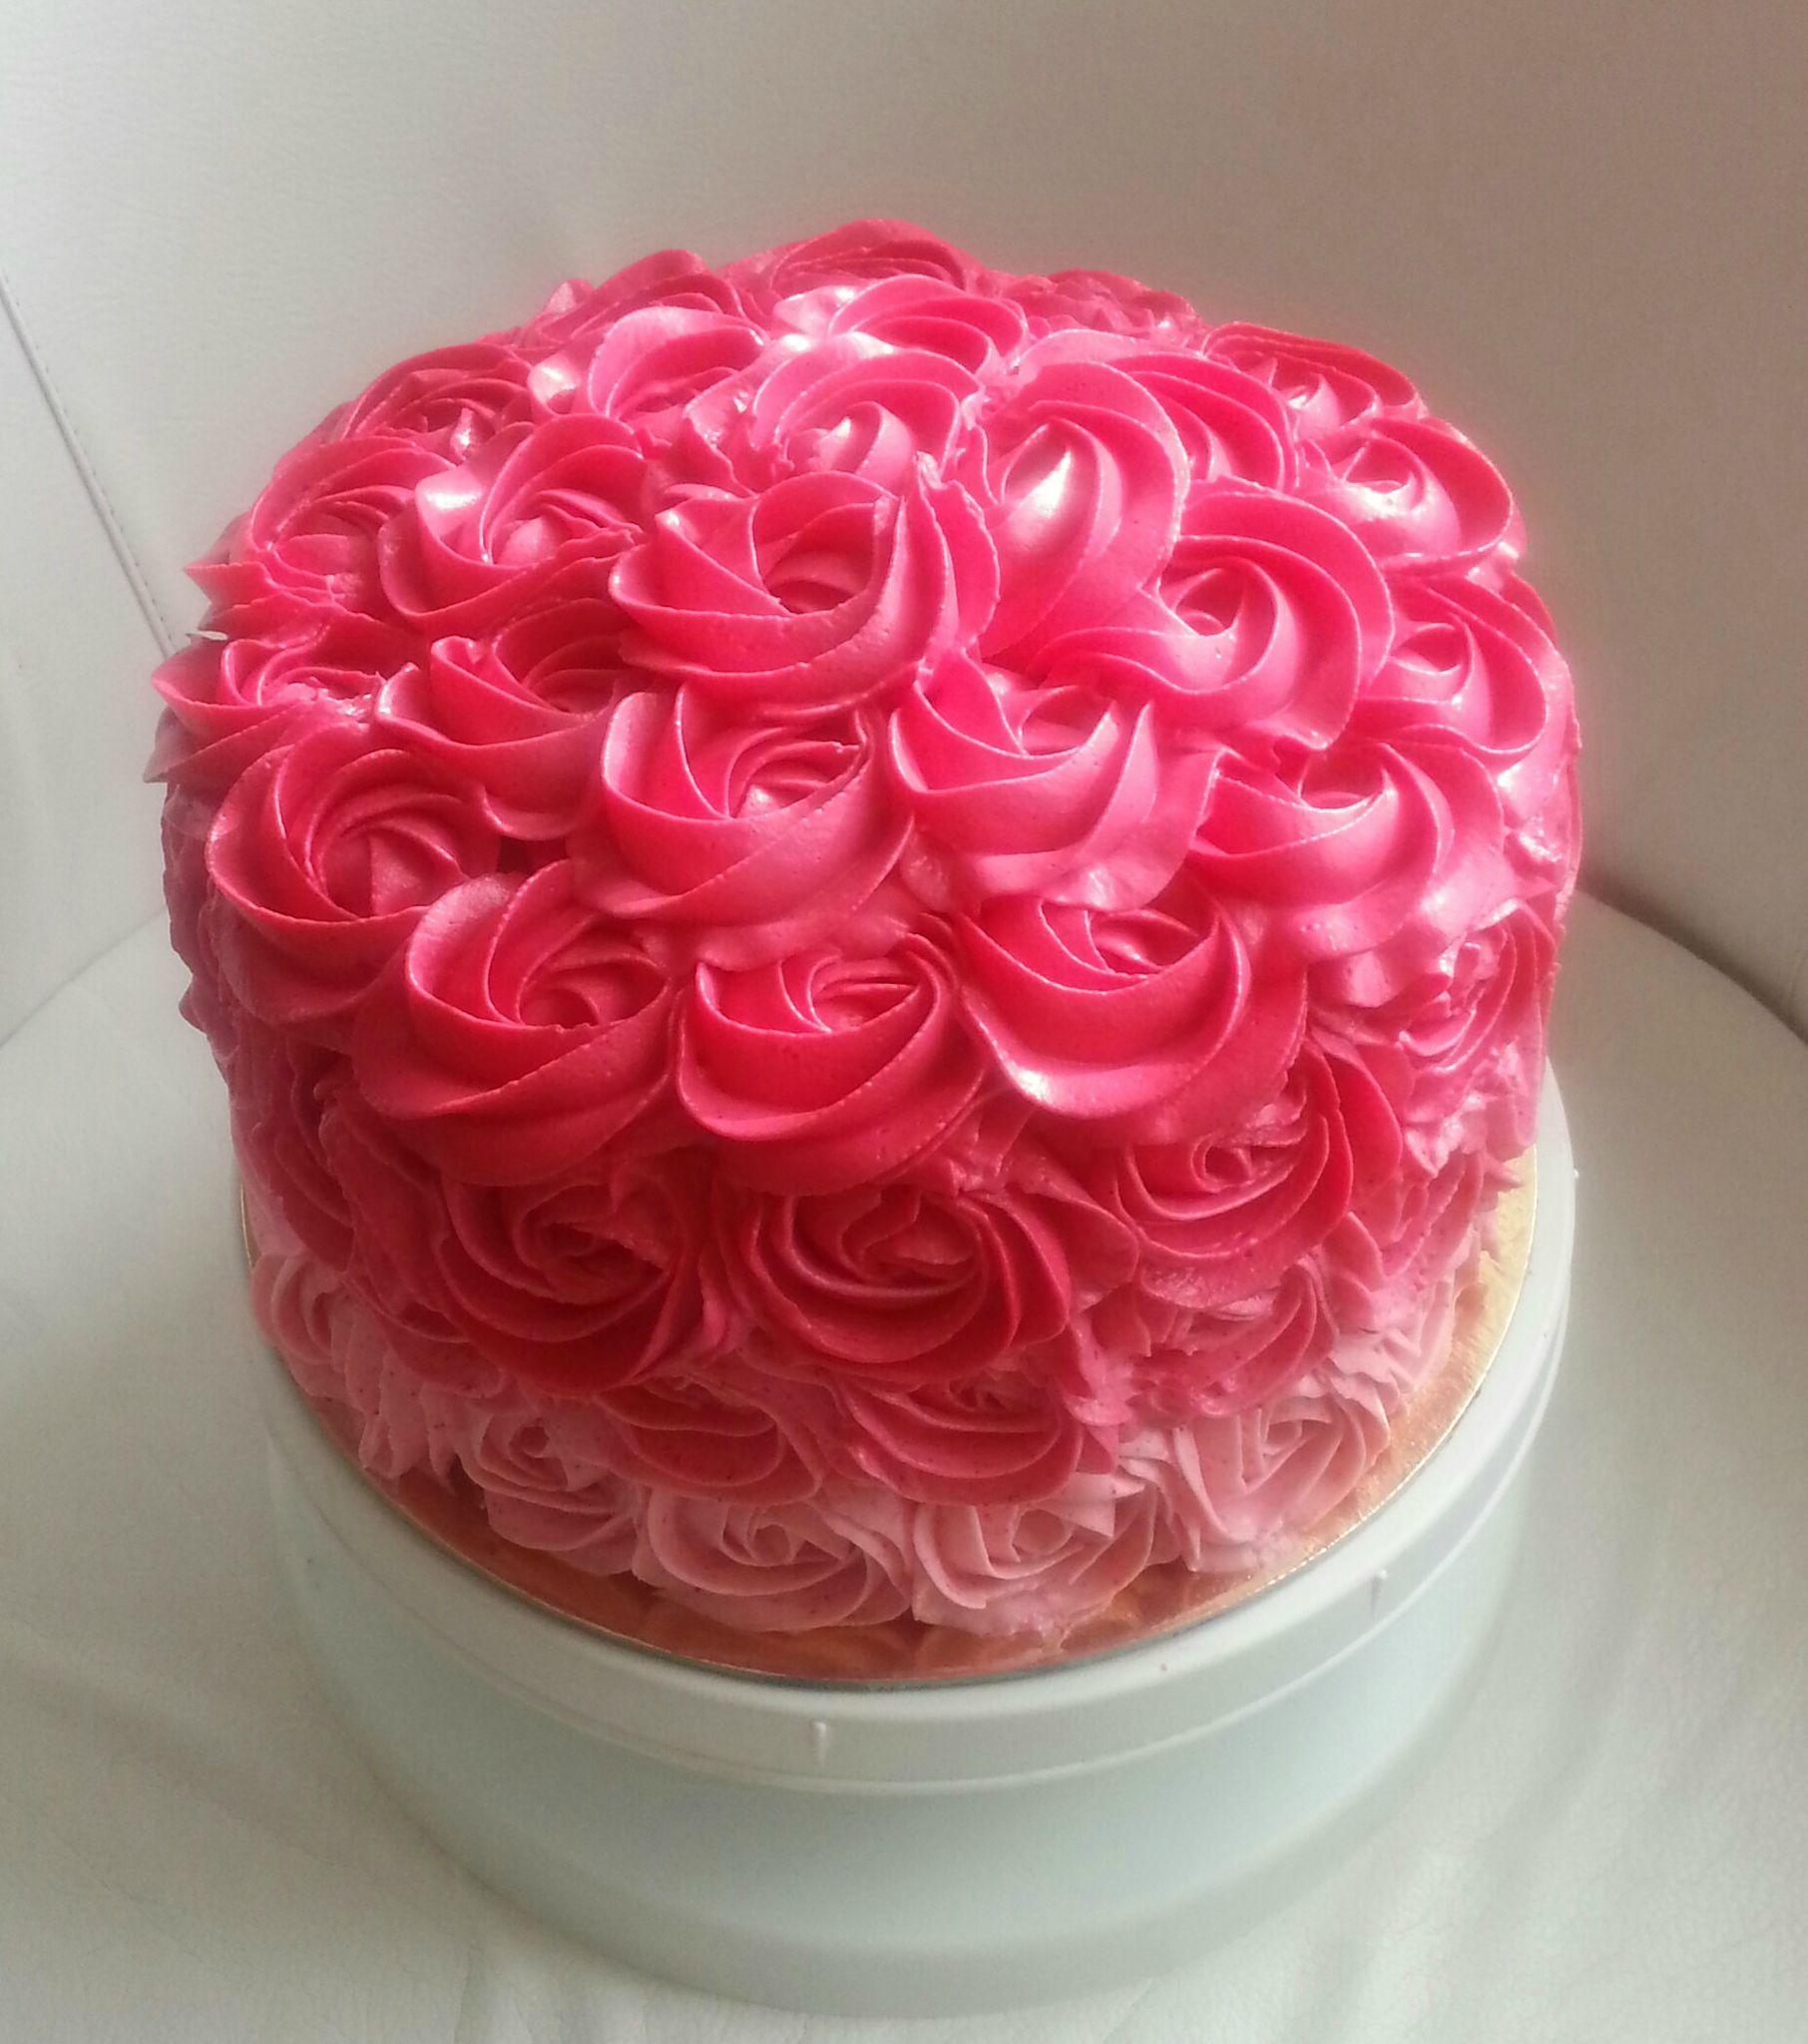 Glacage rose pour gateau au chocolat